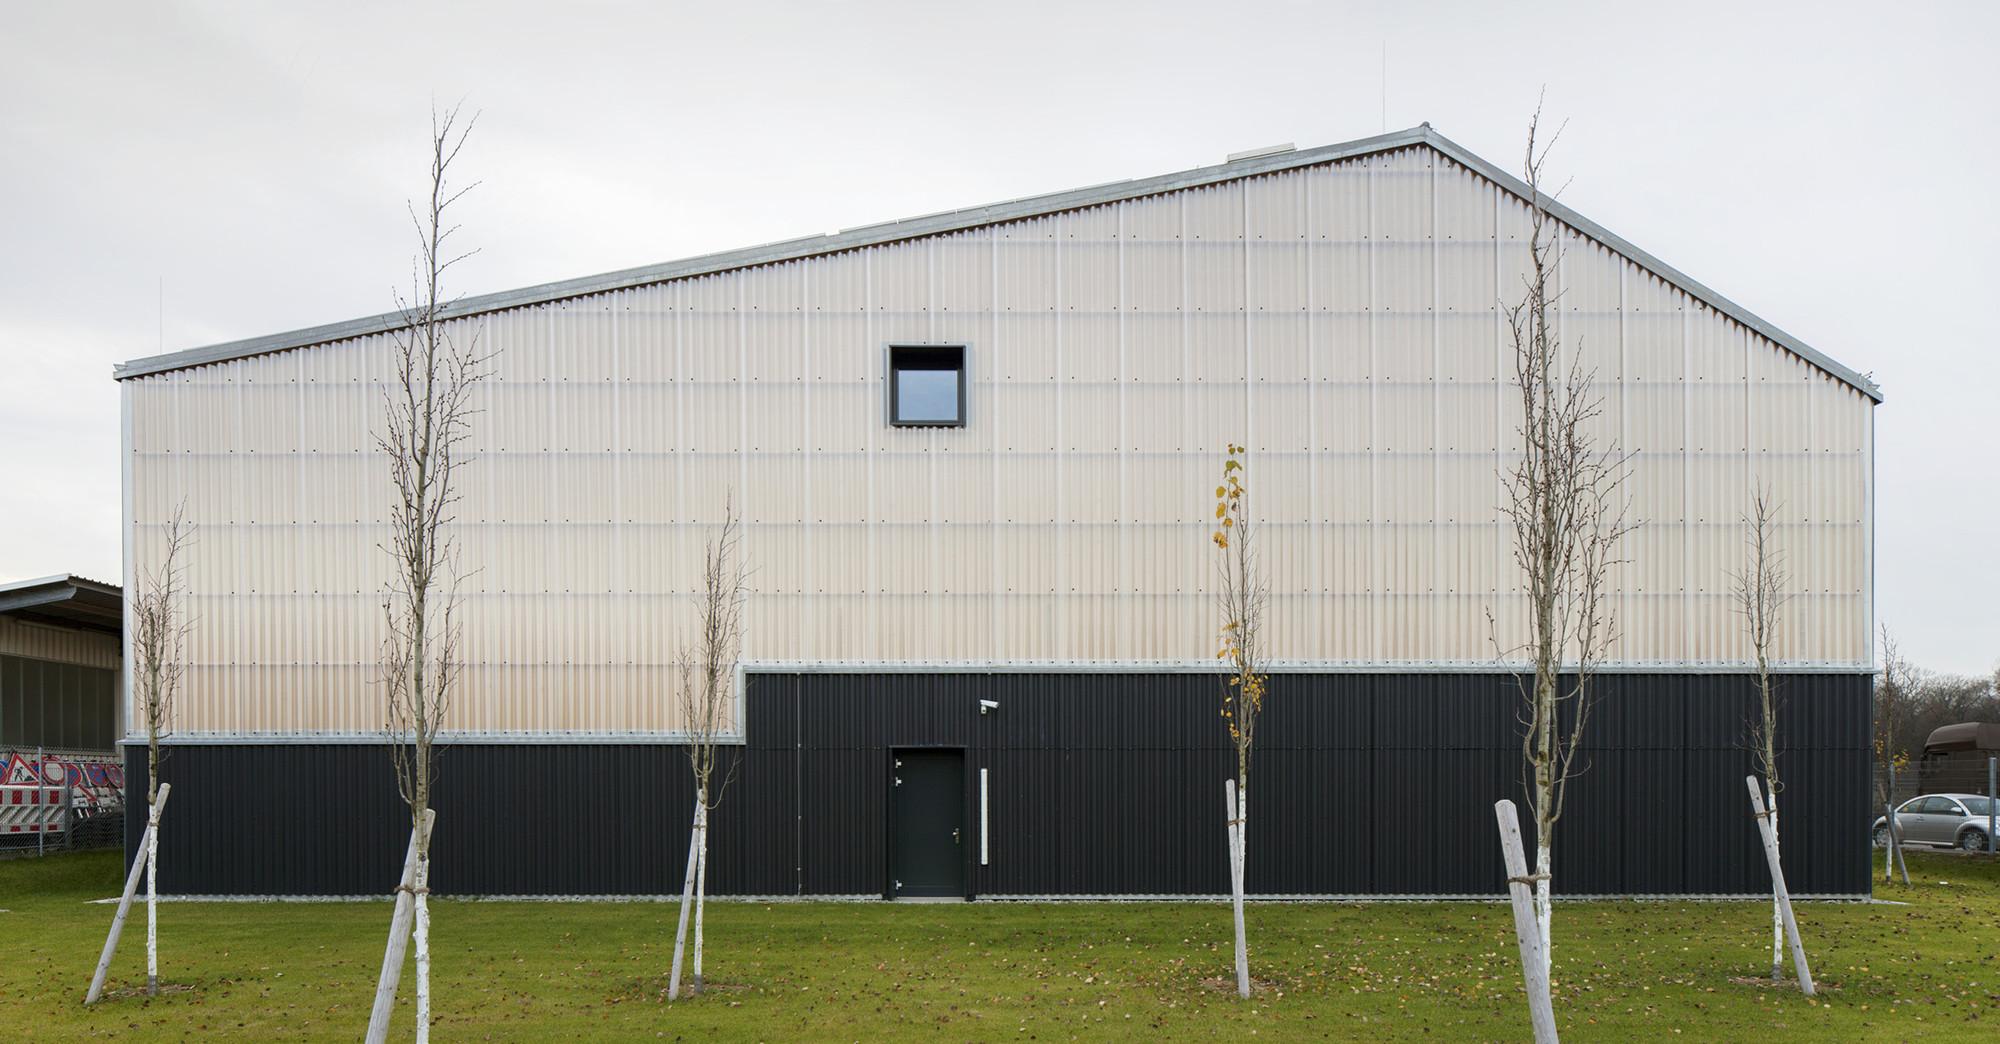 Depósito Central de Arte enFriburgo / Pfeifer Kuhn Architekten, © Claudius Pfeifer